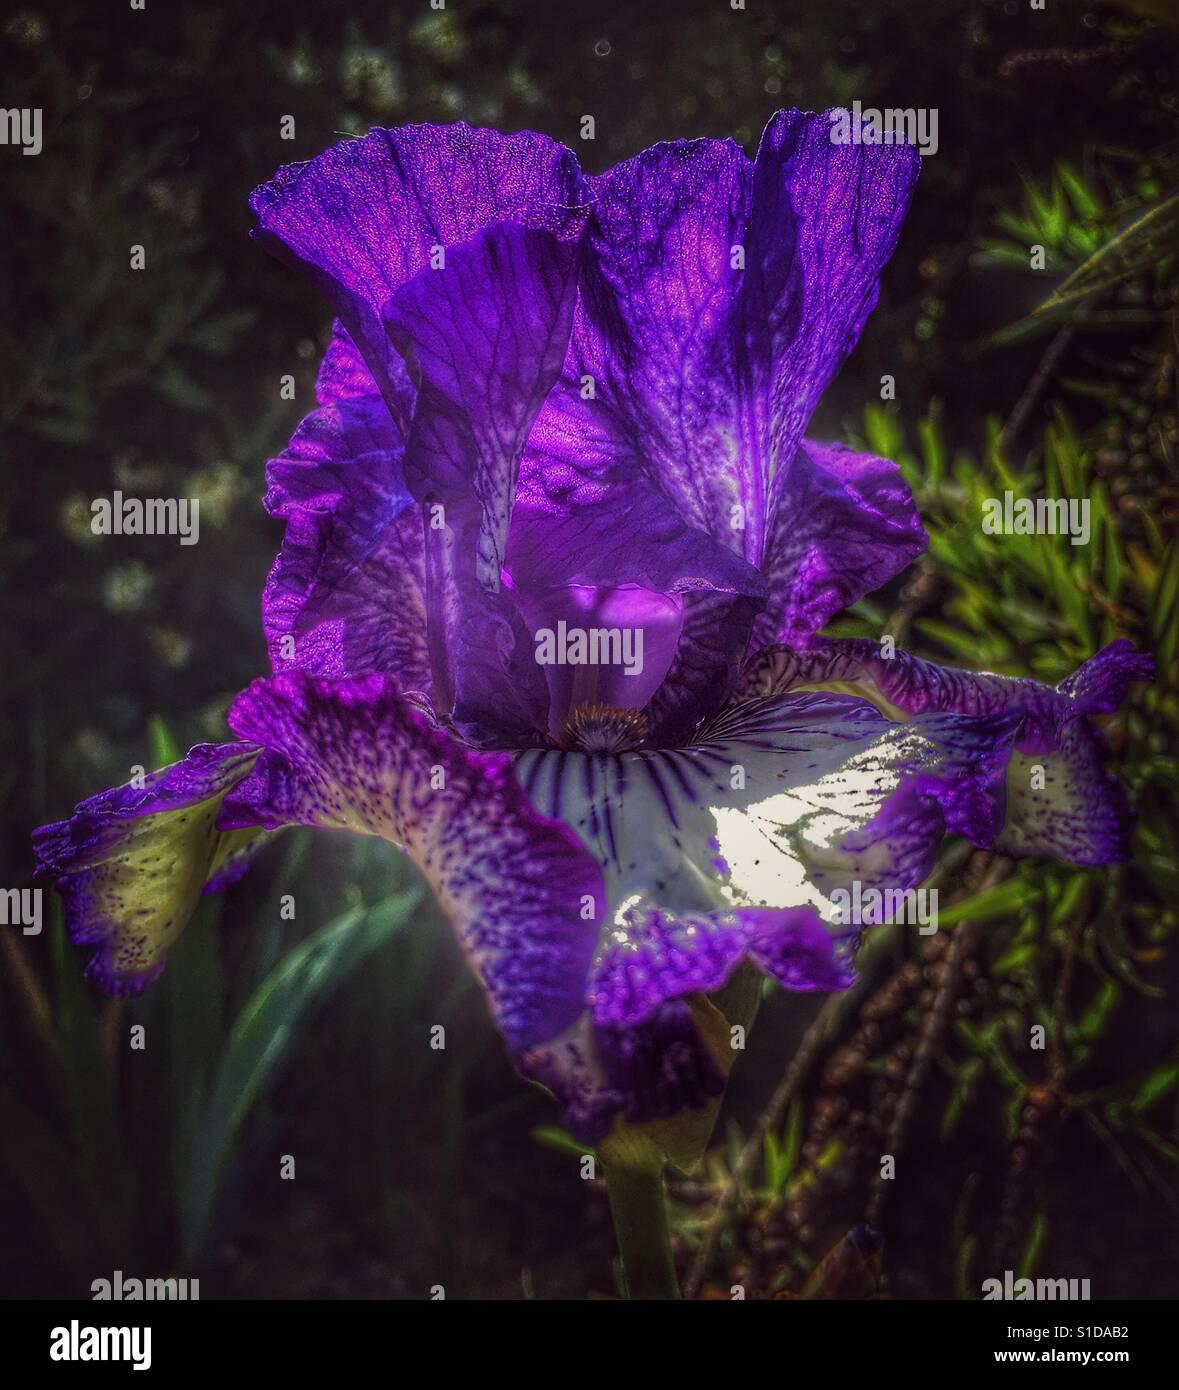 Tall Bearded Iris Purple And White Flower Stock Photo 310694806